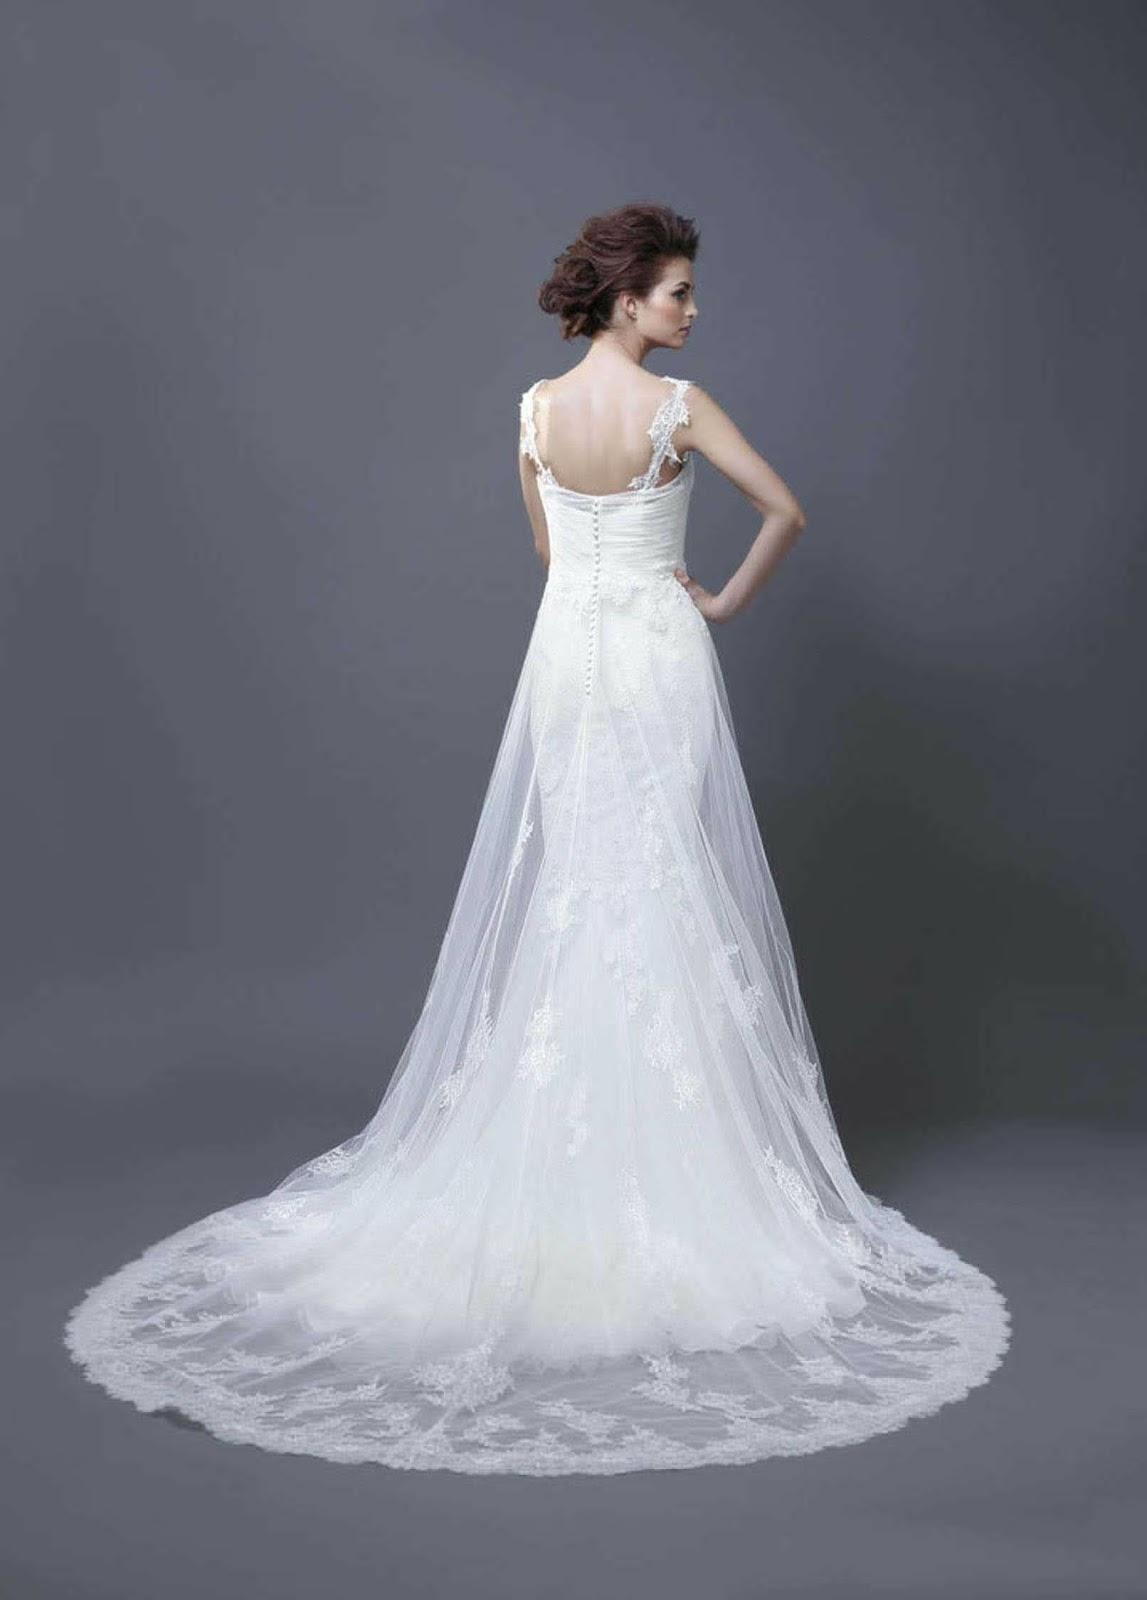 Enzoani bridal 2013 wedding dresses for Enzoani fabi wedding dress